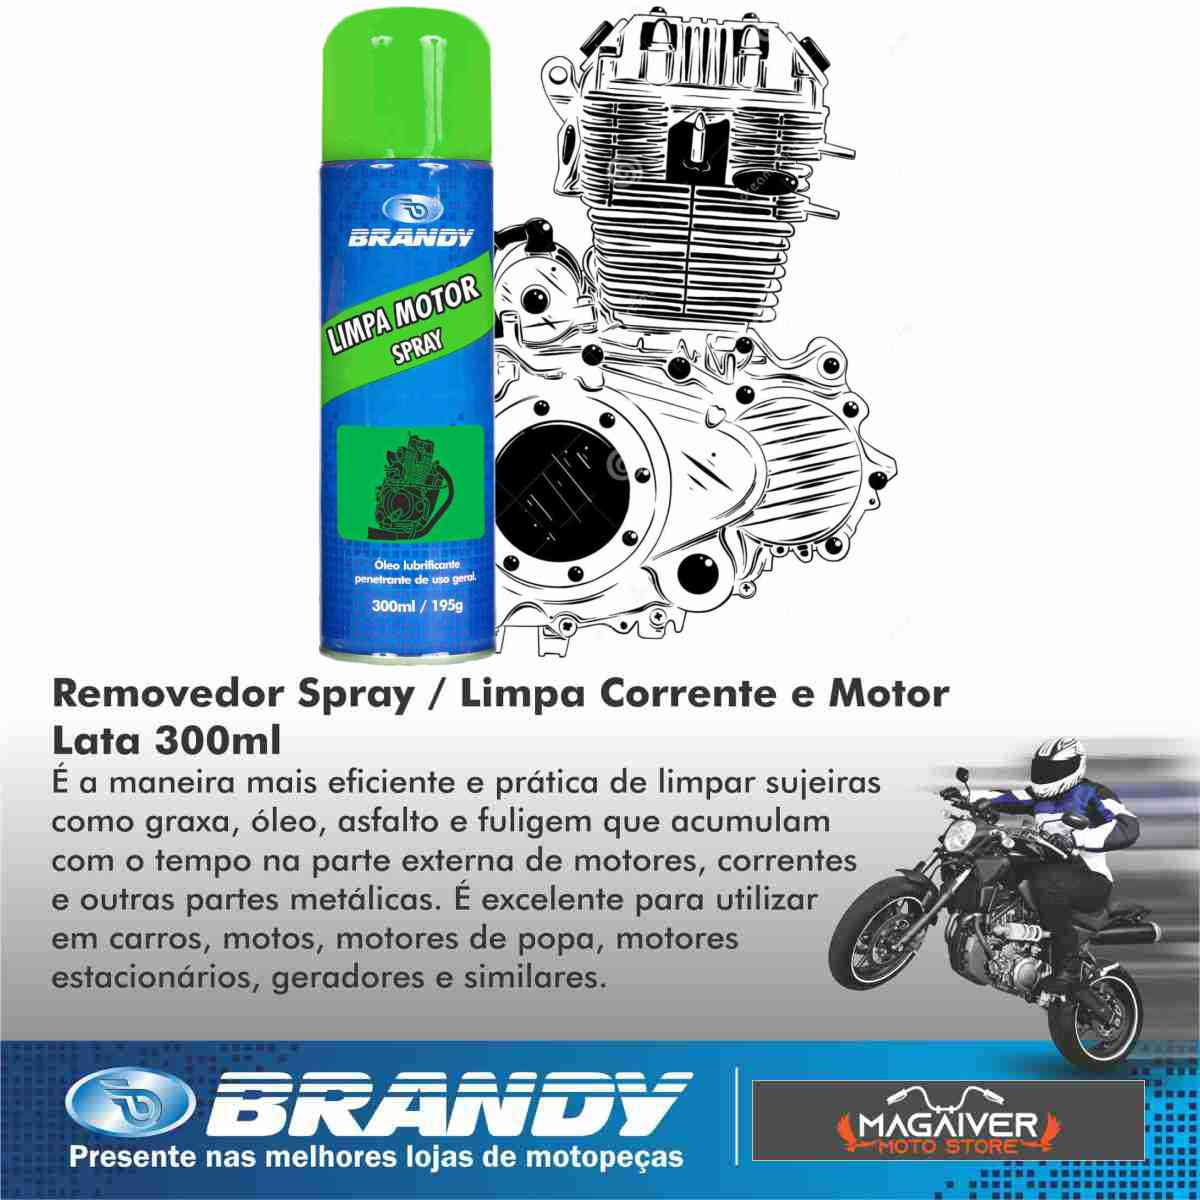 KIT 1 GRAXA ADESIVA MOTO + 1 LIMPADOR CORRENTE E MOTOR + 1 DESENGRIPANTE + 1 REPARADOR PNEU MOTO